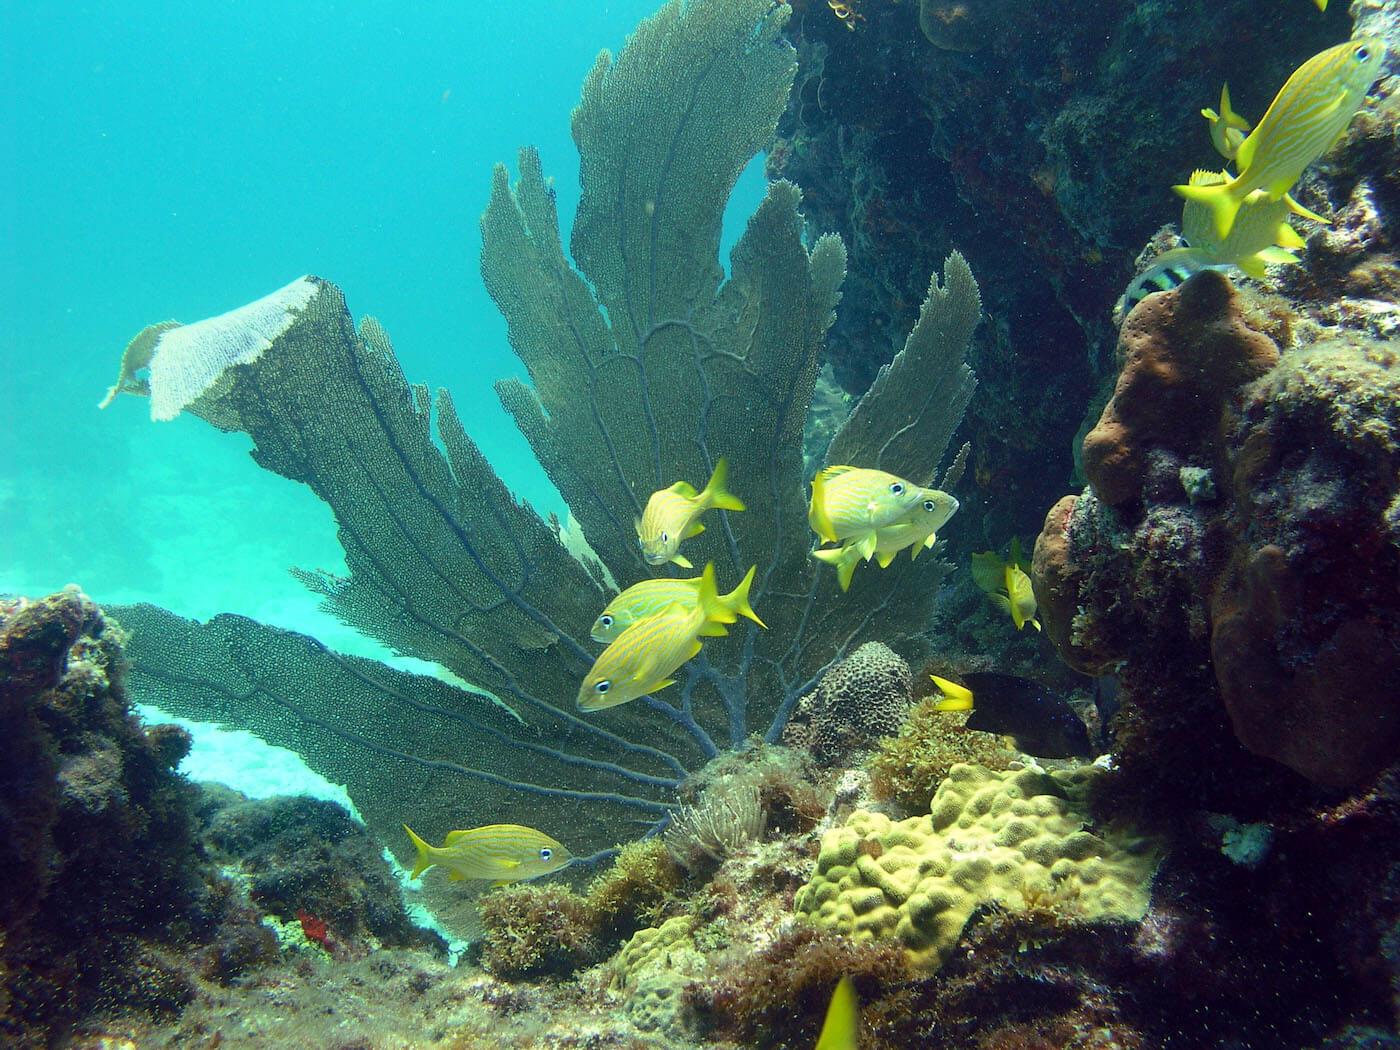 Isla Mujeres Scuba Diving Snorkeling Manchones Reef Squalo Adventures-23